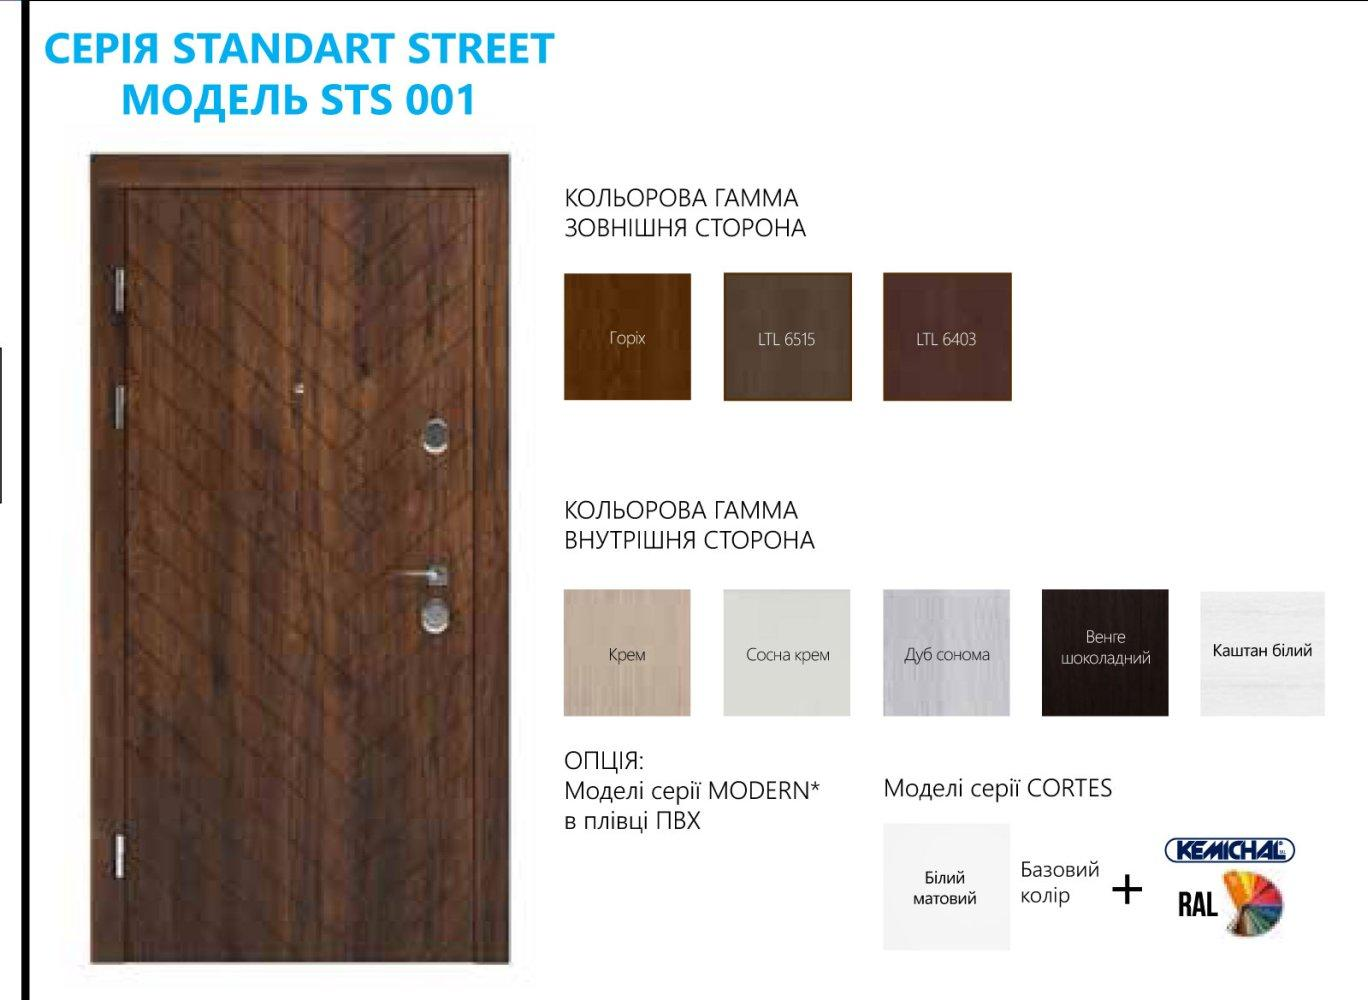 Цветовая гамма входных дверей Rodos STS Standart Street STS 001